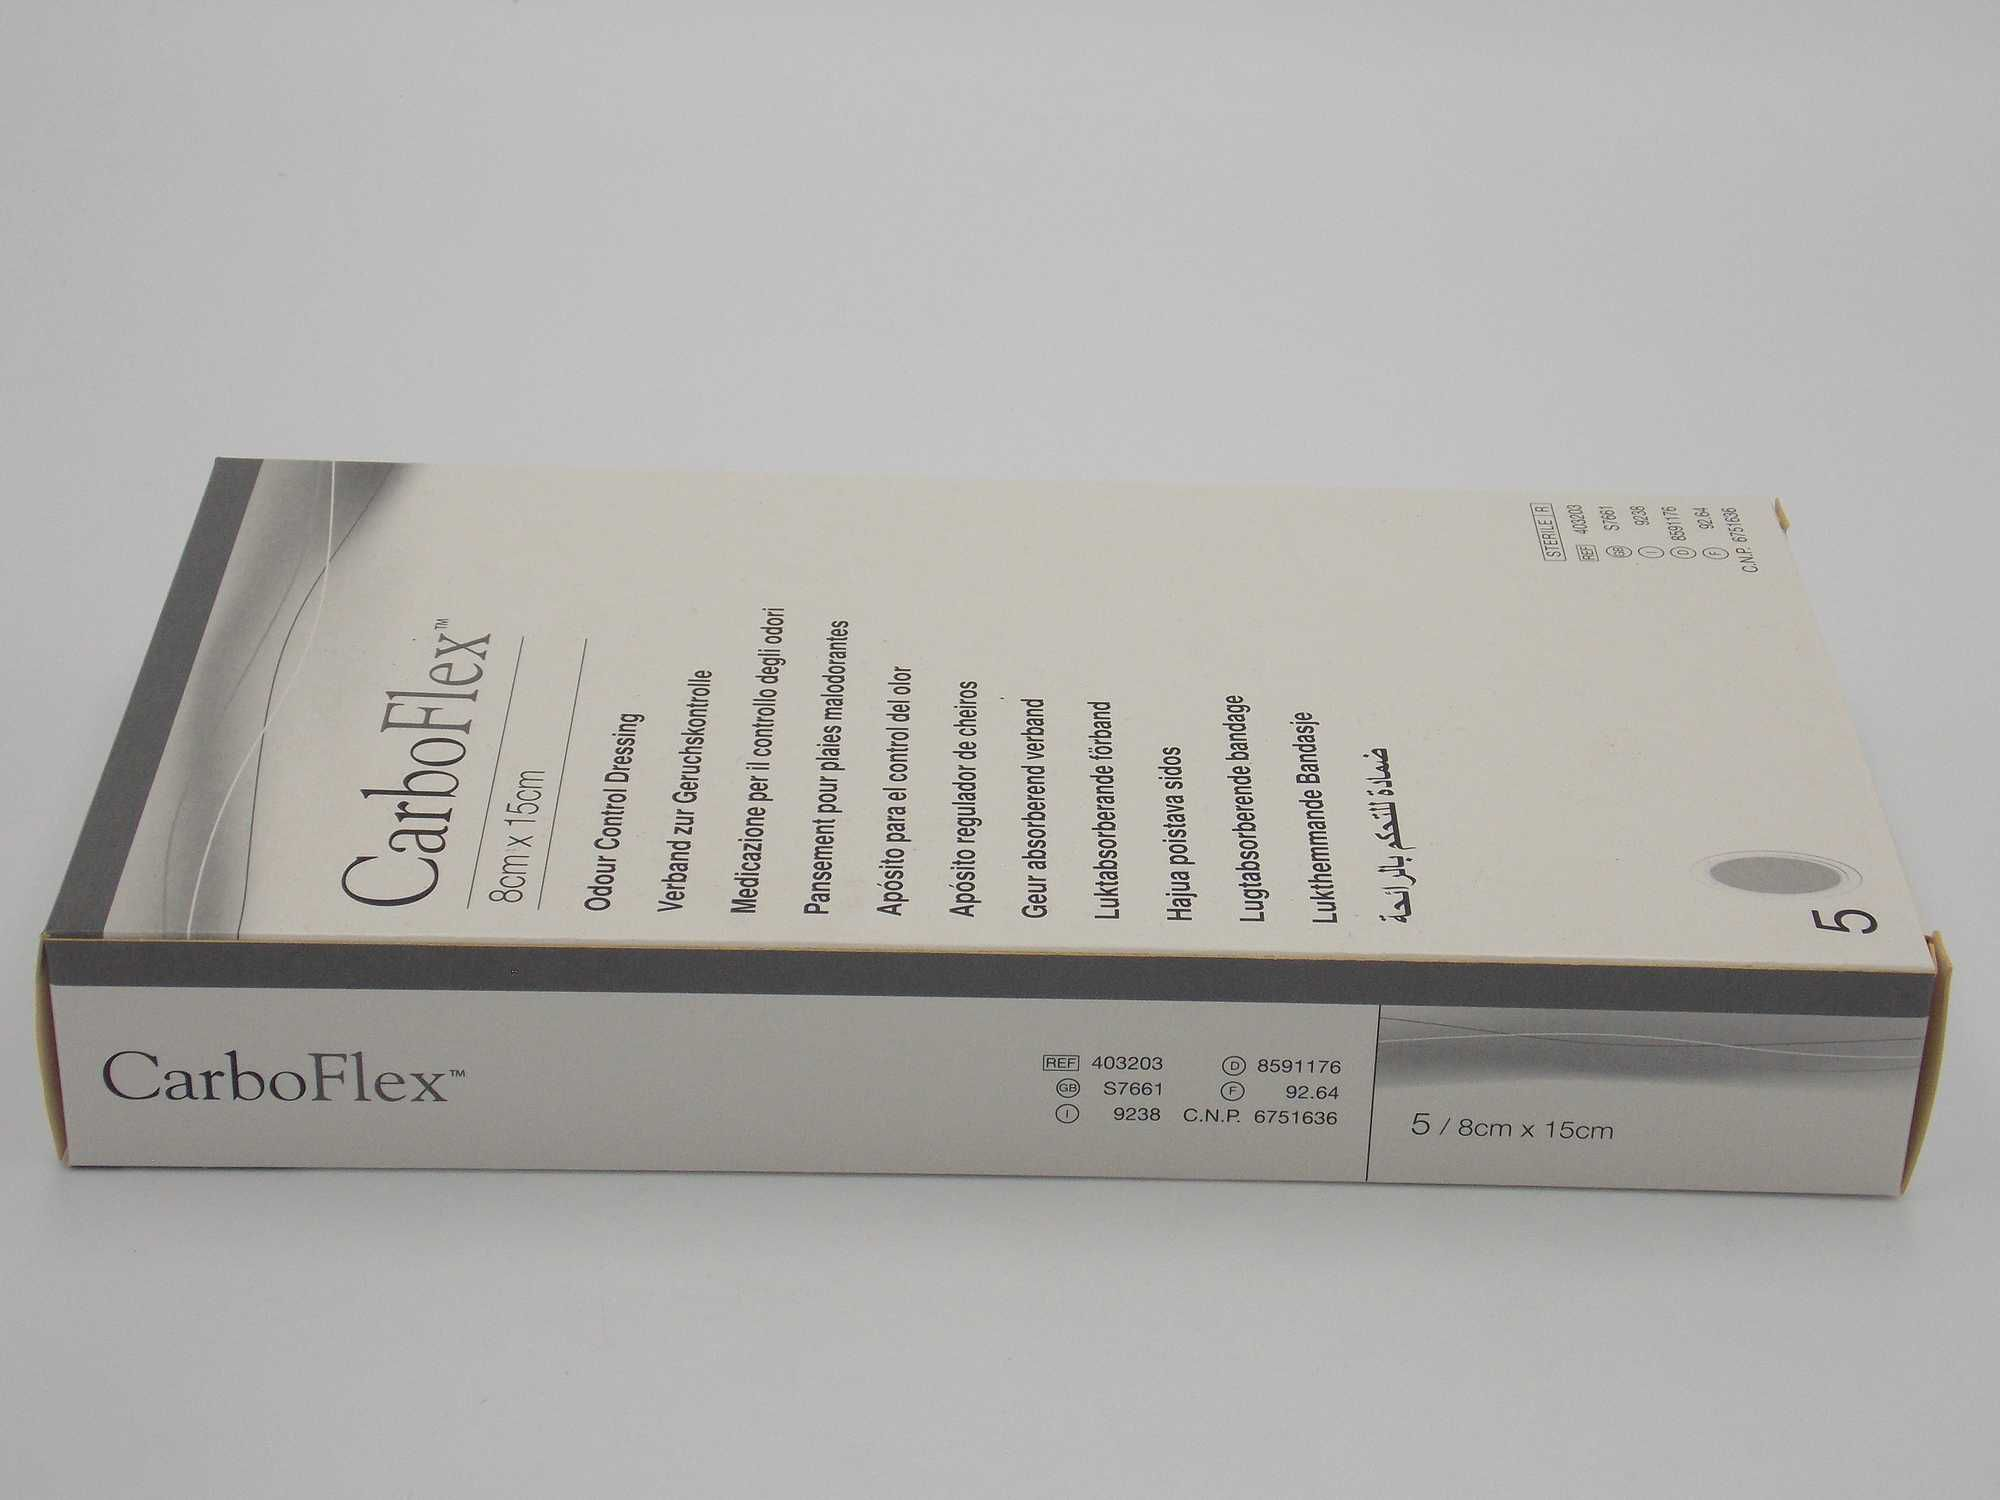 CURATIVO CARBOFLEX  8X15 CM OVAL UND. 403203 - CONVATEC